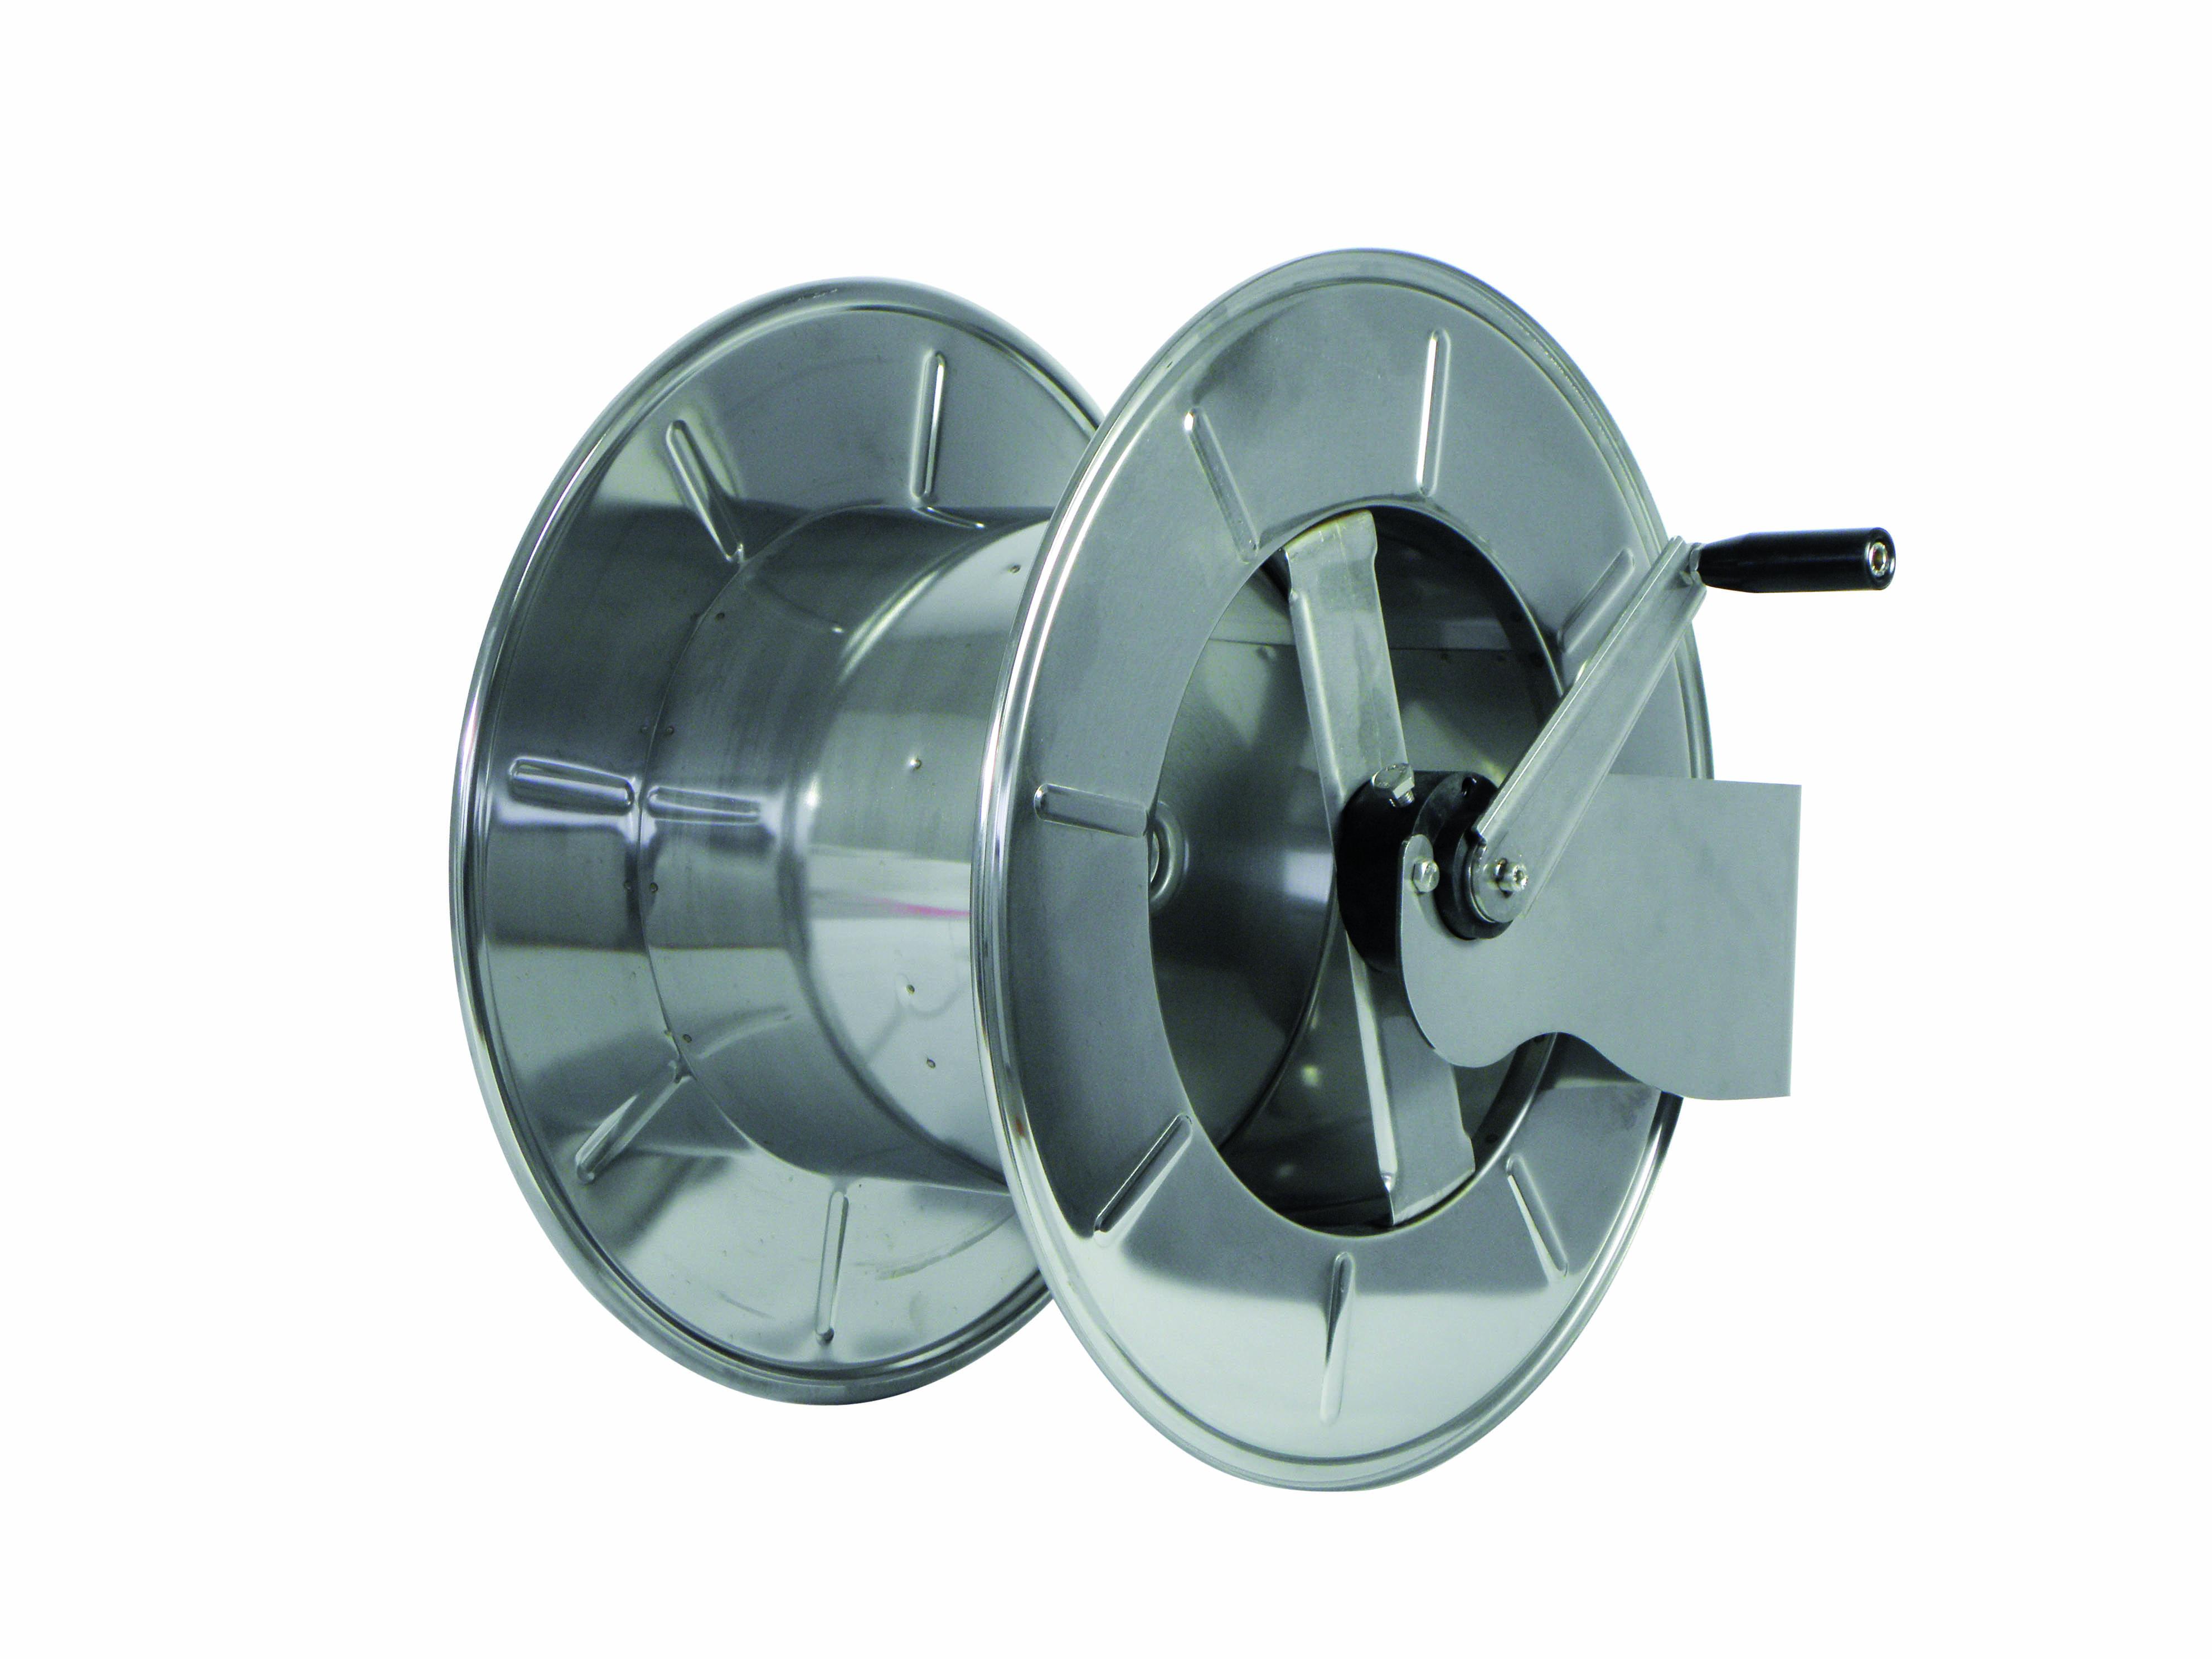 AVM9941 - Carretes de mangueras para agua - Alto flujo 0-80 BAR / 0-1160 PSI